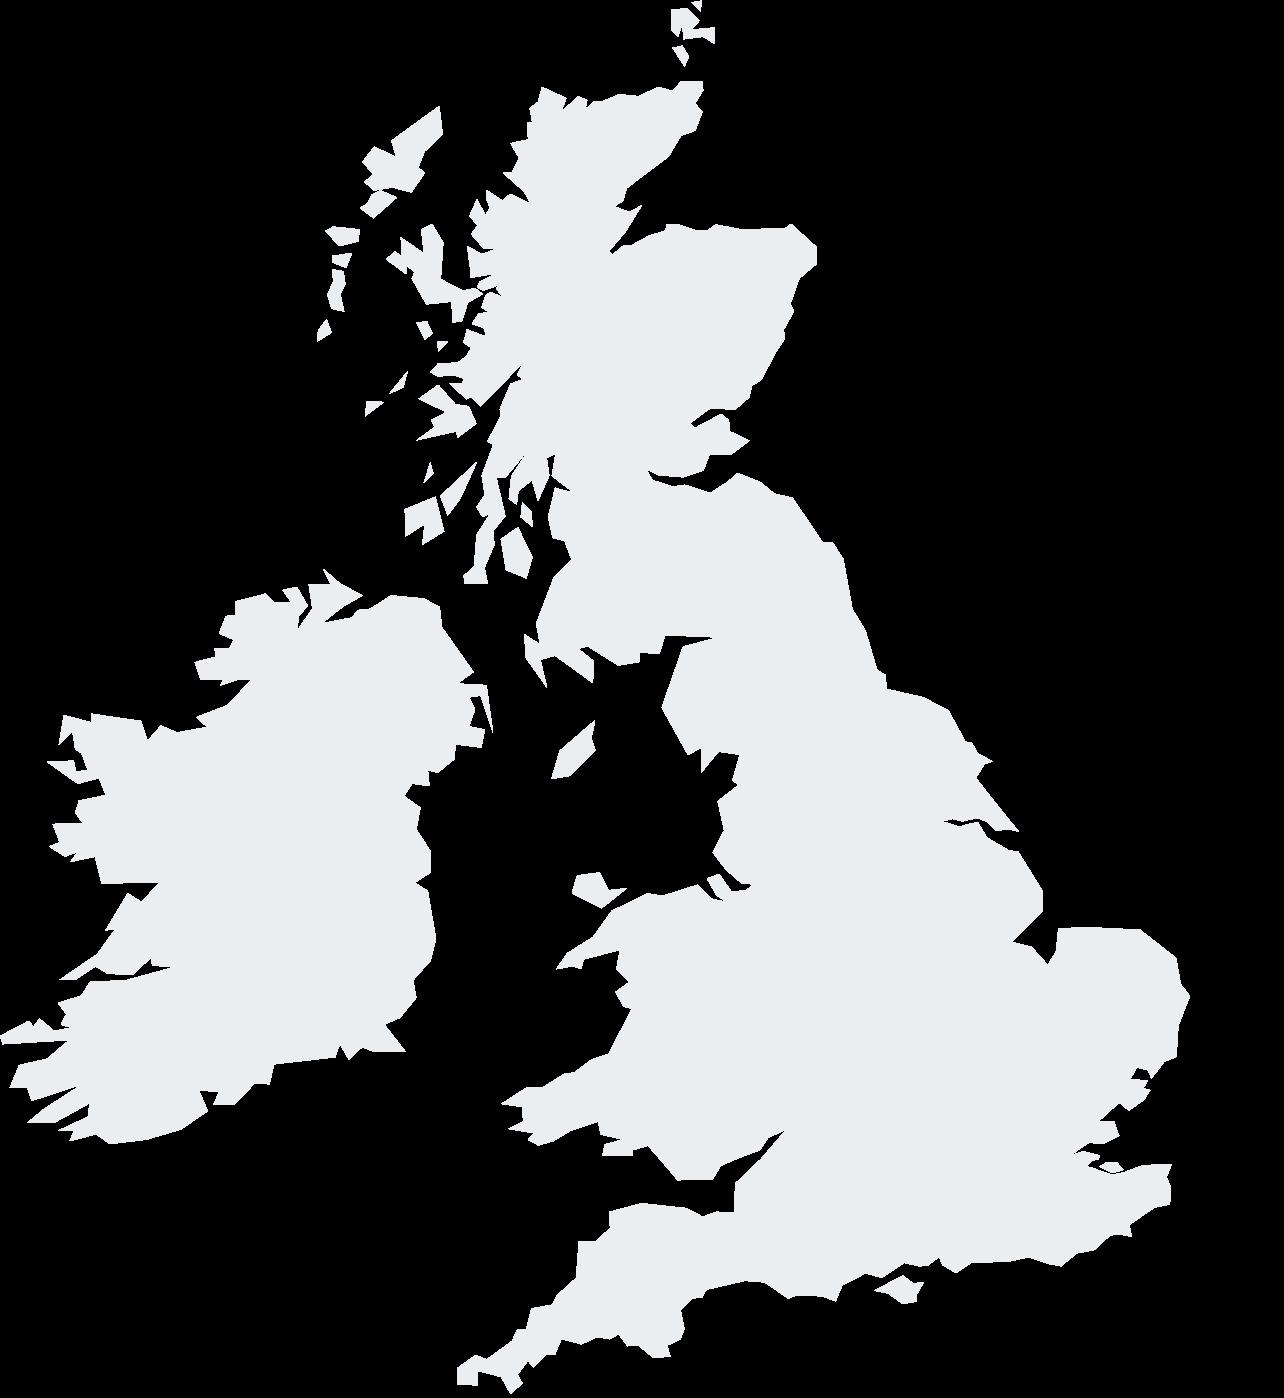 bg-map-uk